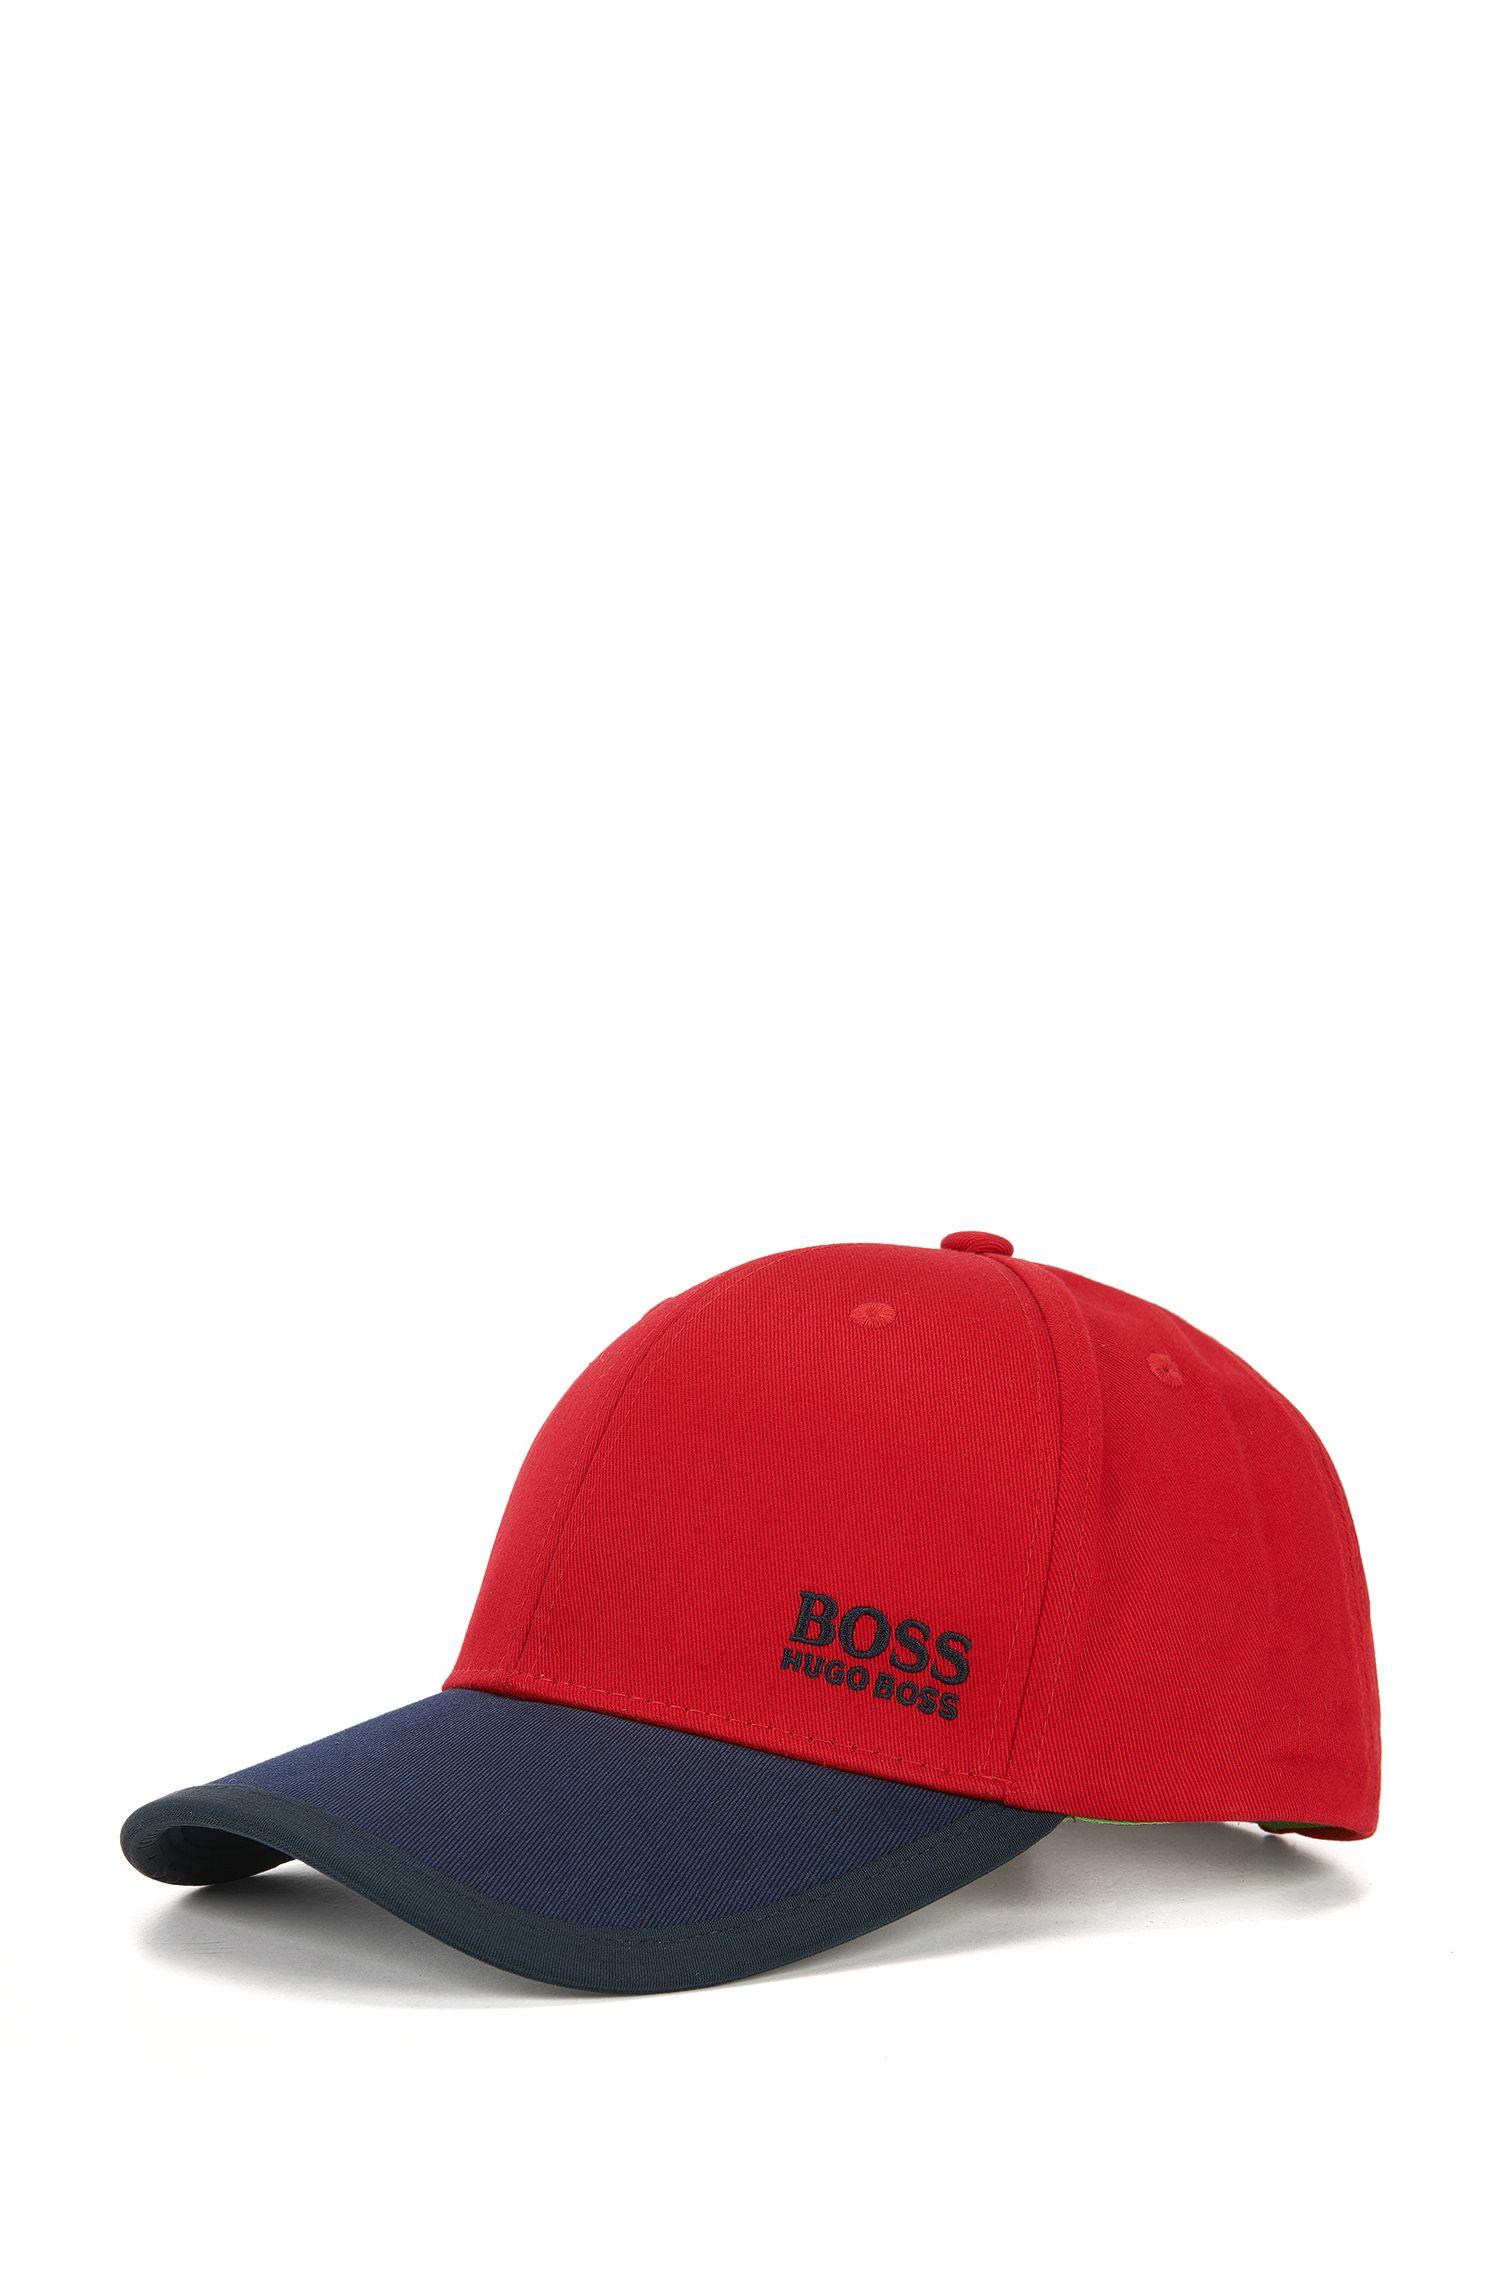 Cotton Baseball Cap | Cap